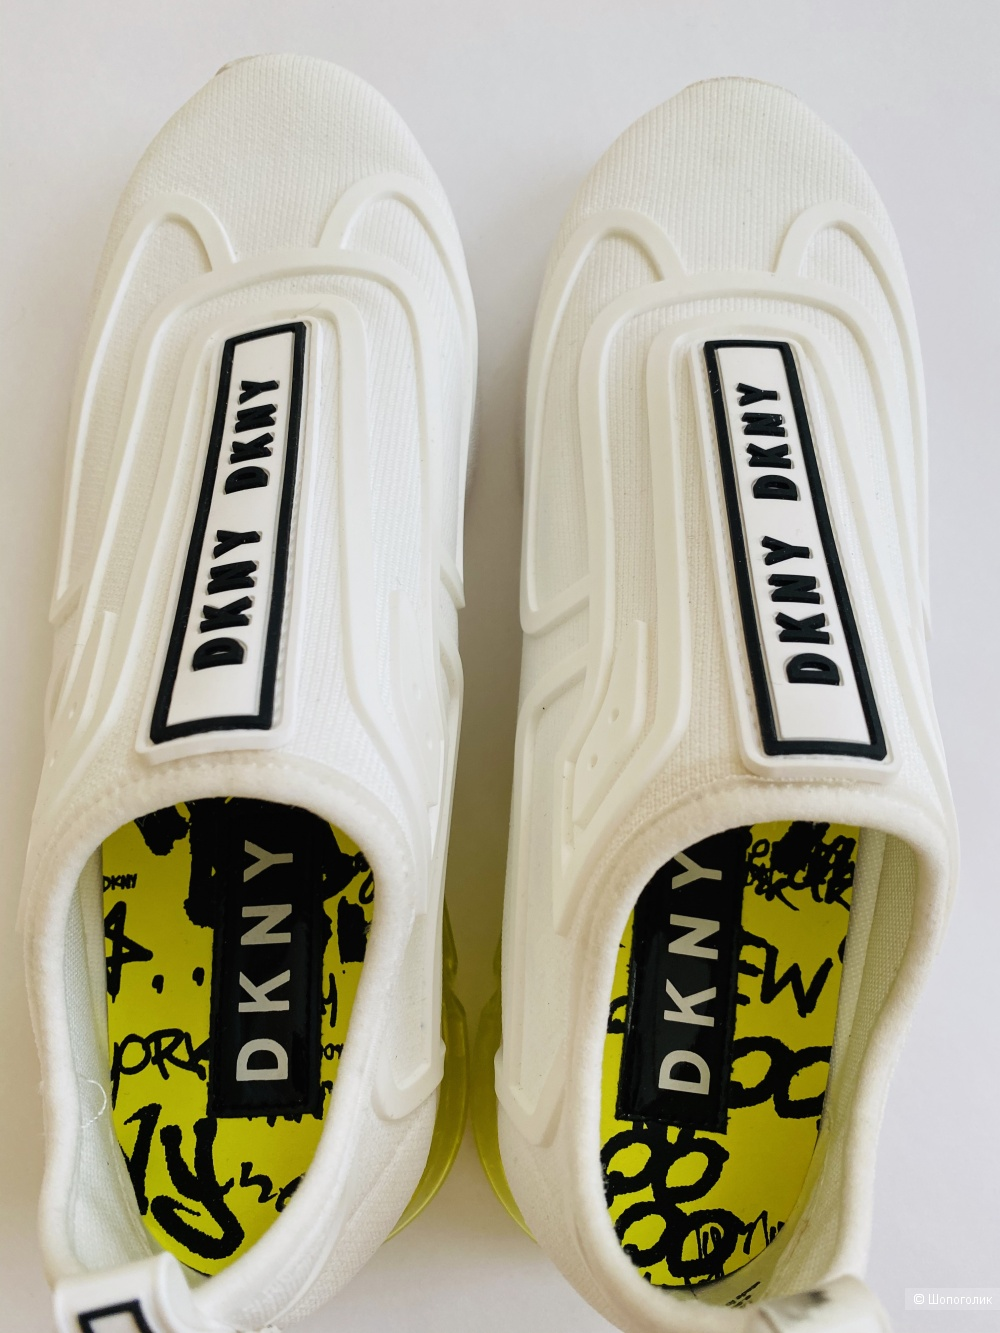 Кроссовки Dkny размер 39